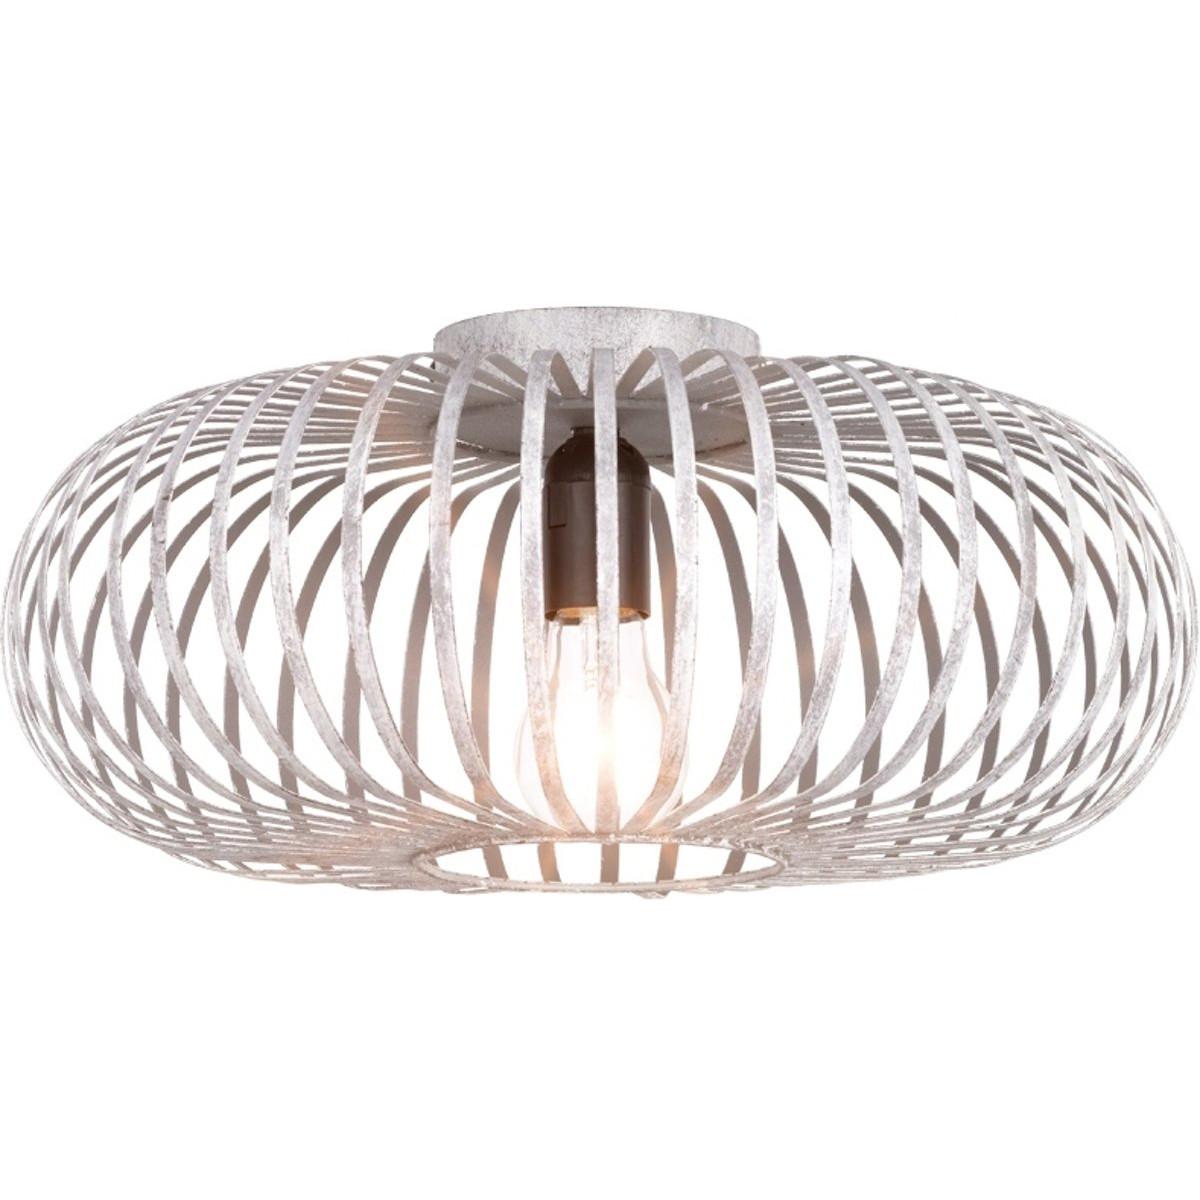 LED Plafondlamp - Plafondverlichting - Trion Johy - E27 Fitting - Rond - Industrieel - Mat Grijs - A